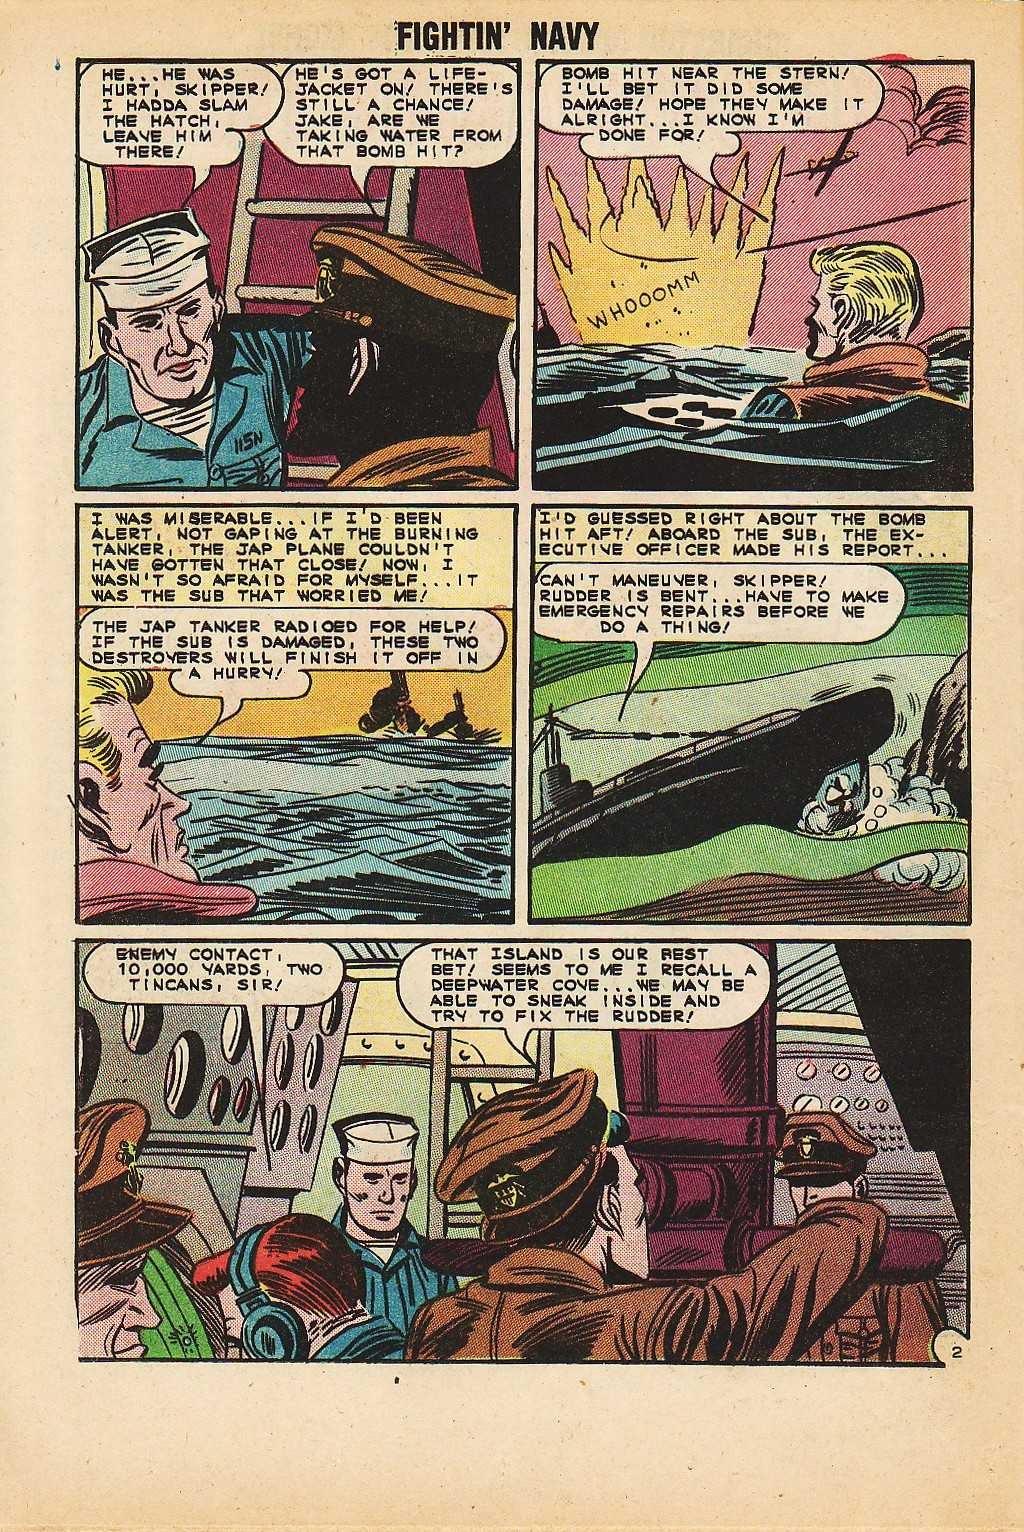 Read online Fightin' Navy comic -  Issue #116 - 20